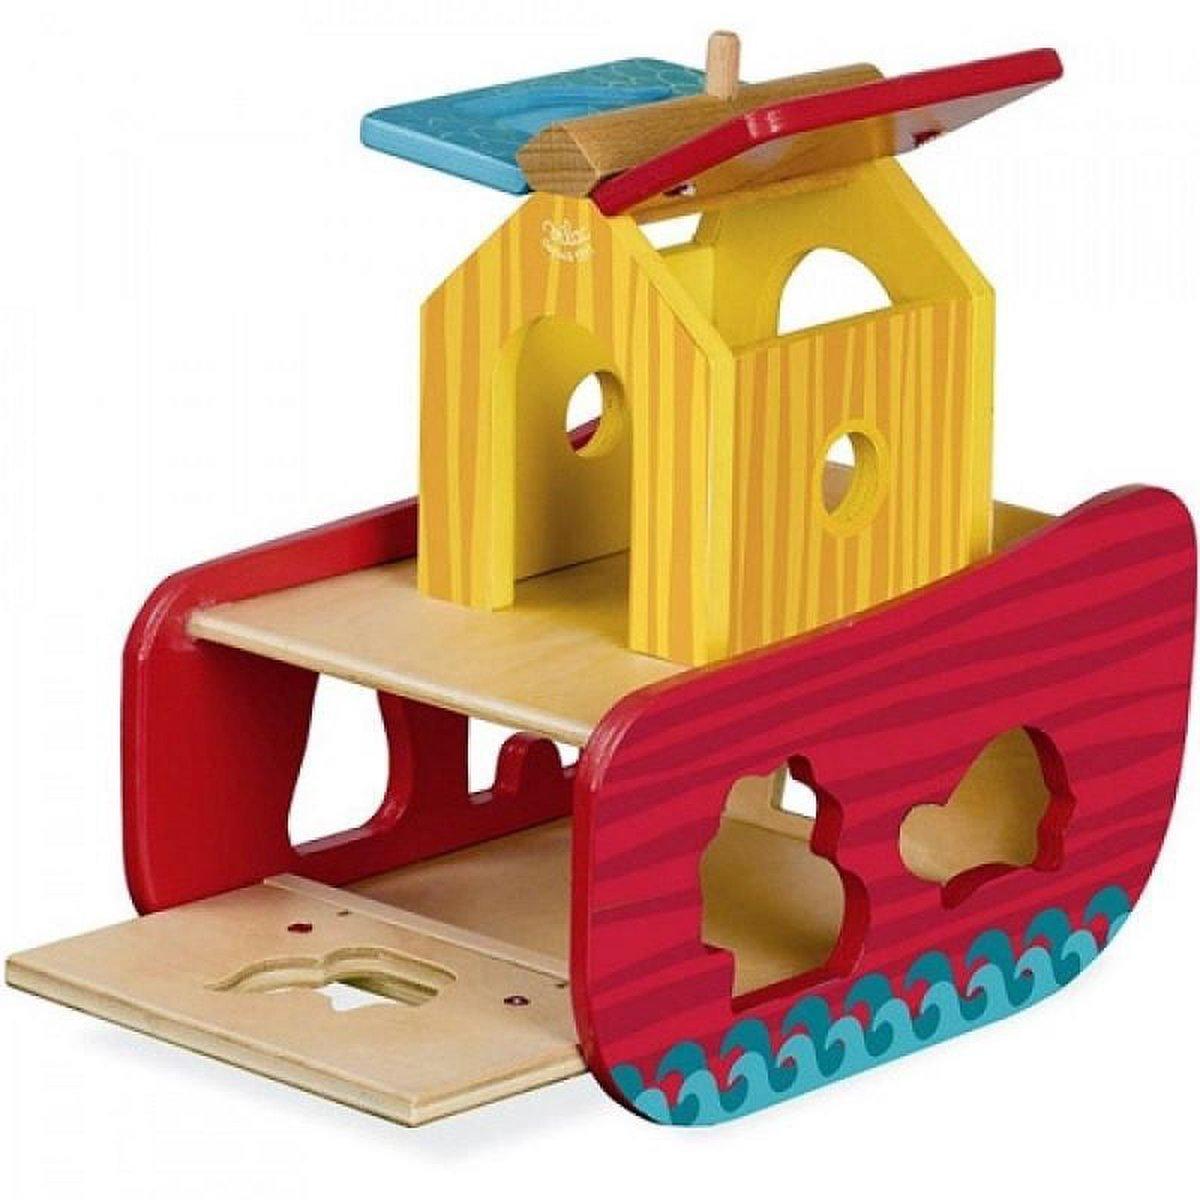 janod houten vormendoos klokhuis | ilovespeelgoed.nl